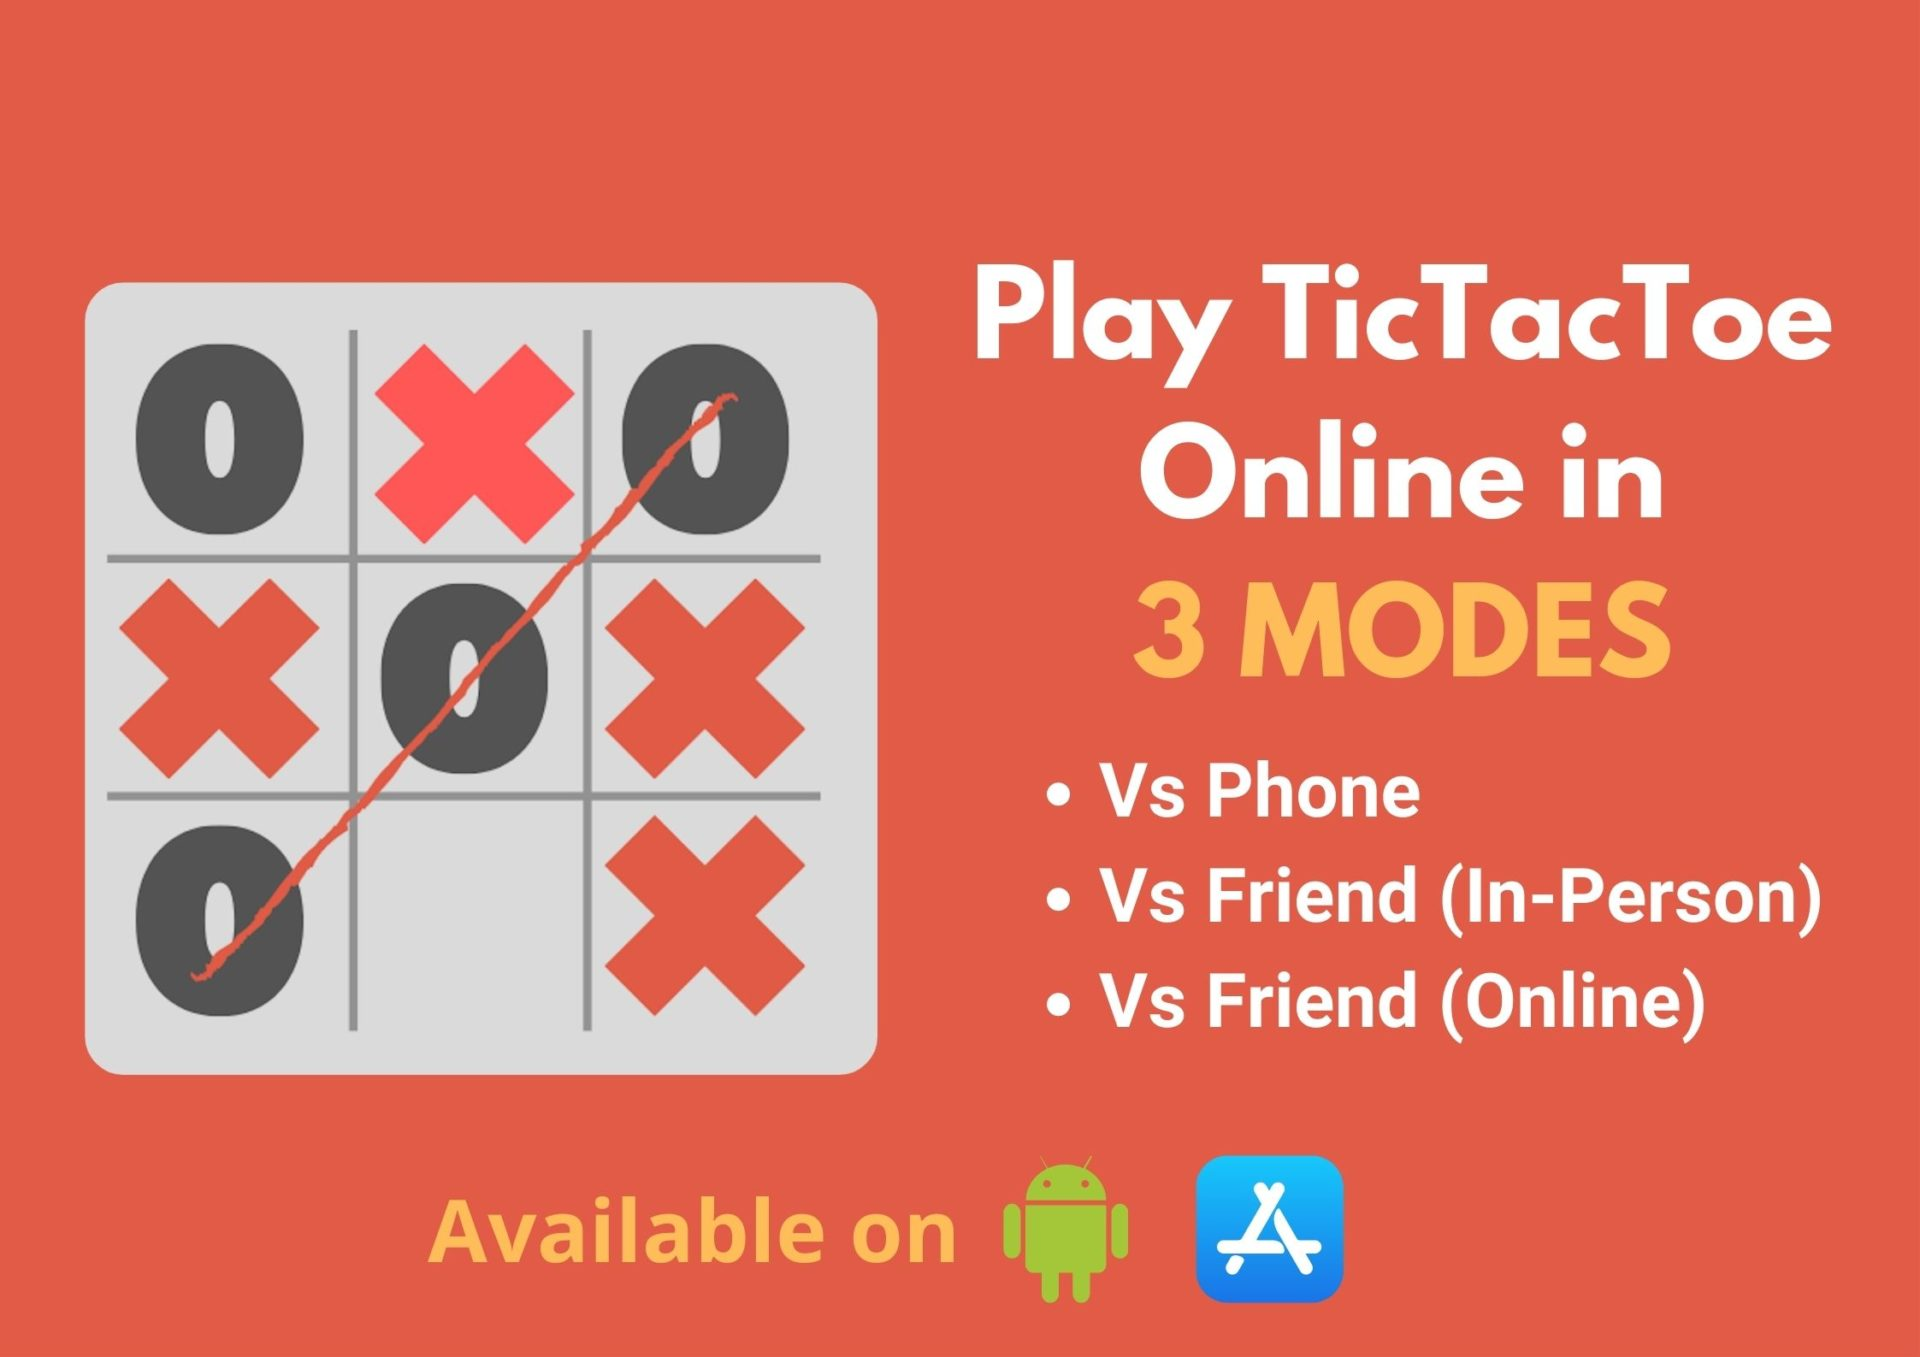 Play TicTacToe Online